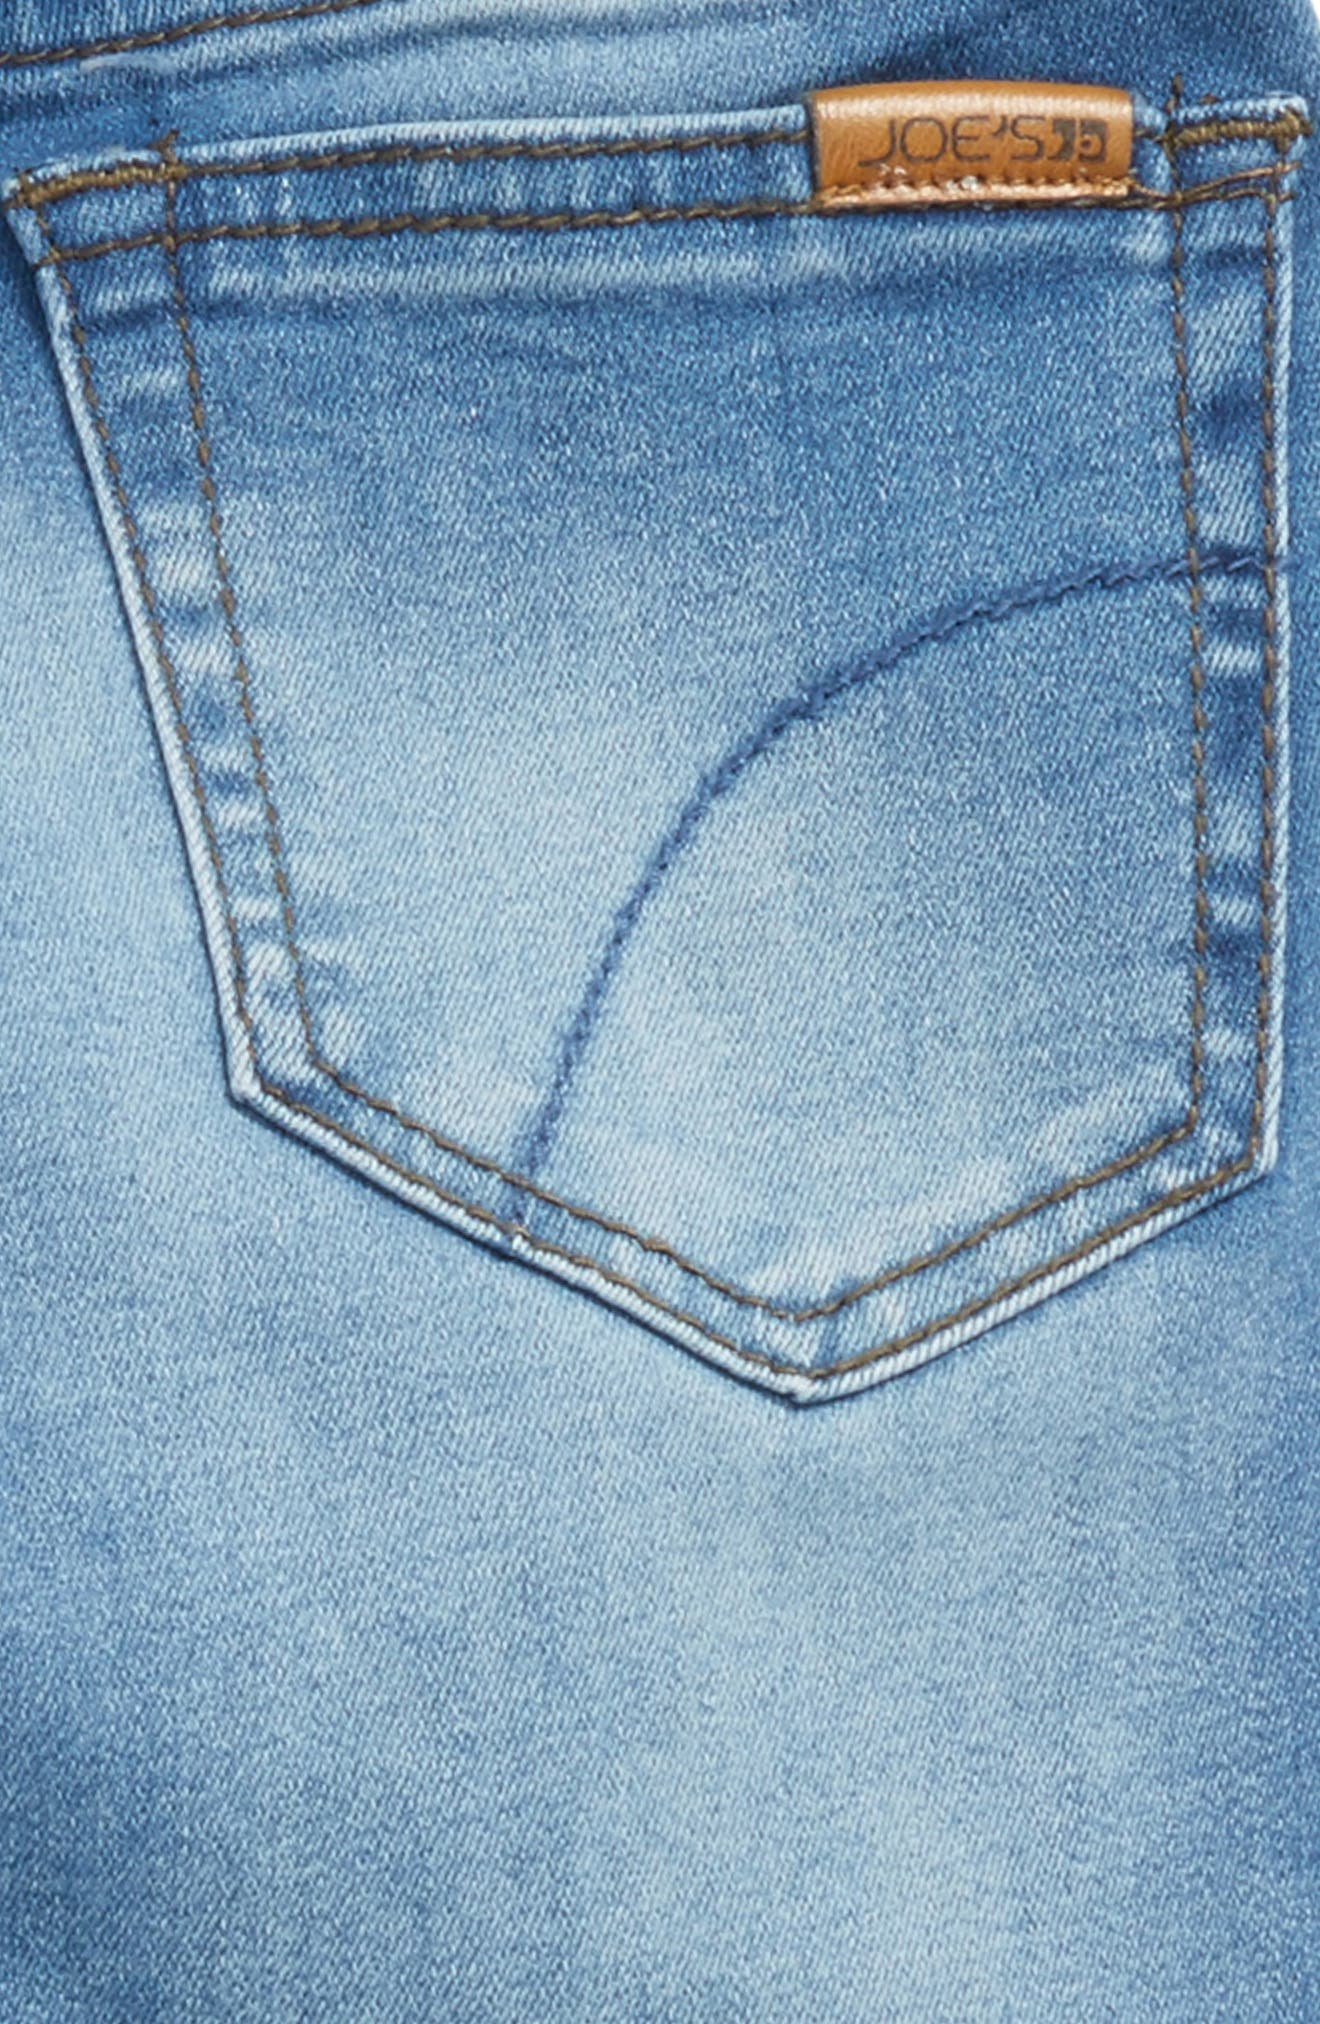 Rad Slim Fit Stretch Jeans,                             Alternate thumbnail 3, color,                             463